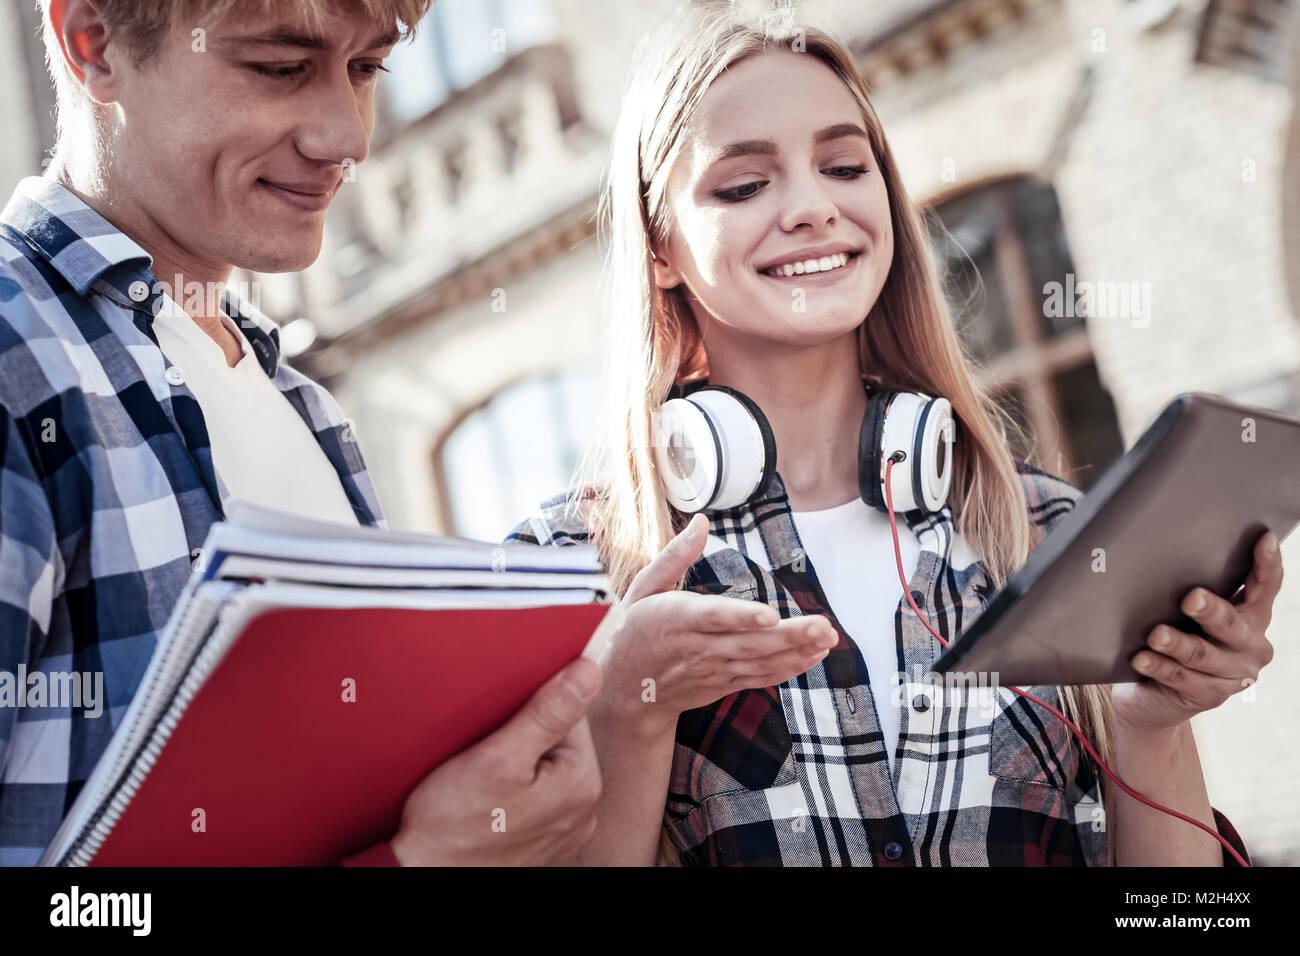 Joyful positive students talking to each other - Stock Image